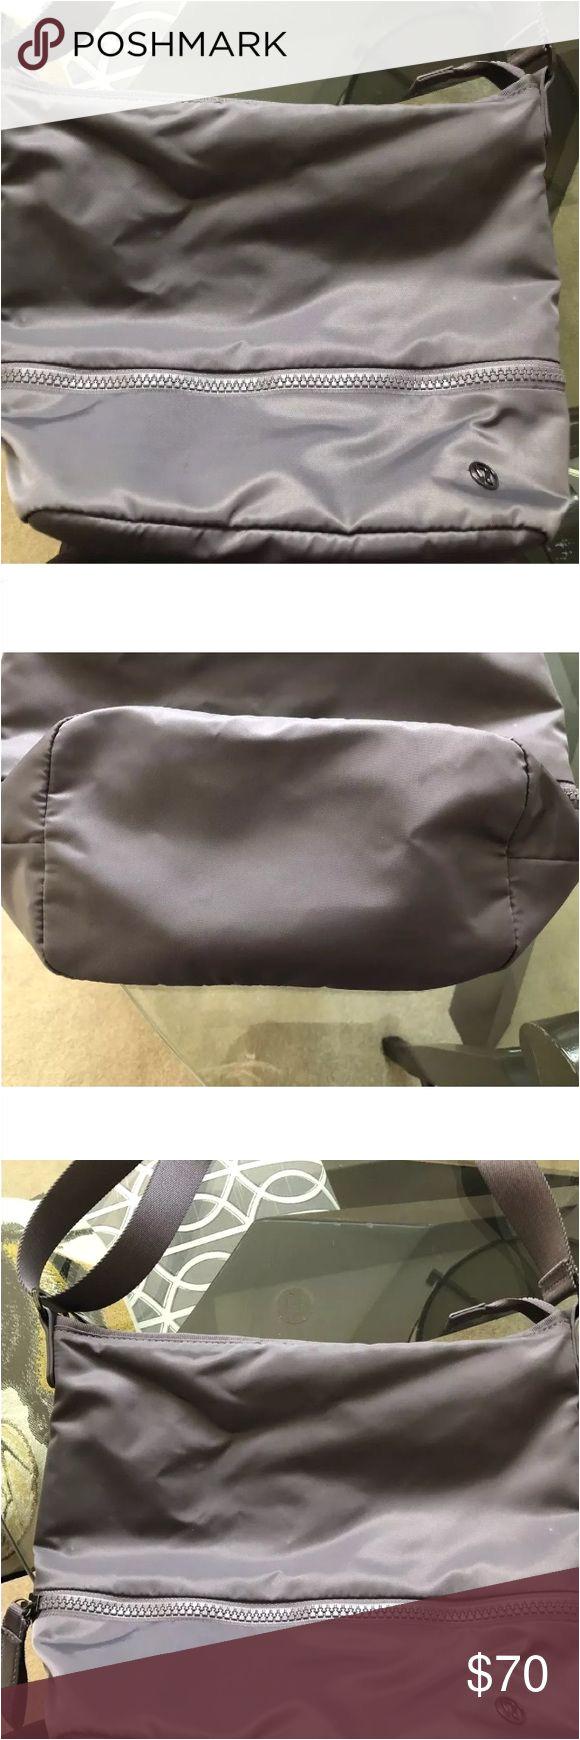 lululemon go lightly shoulder bag go lightly shoulder bag magnum light purple excellent used condition smoke free home fabric is water repellent durable